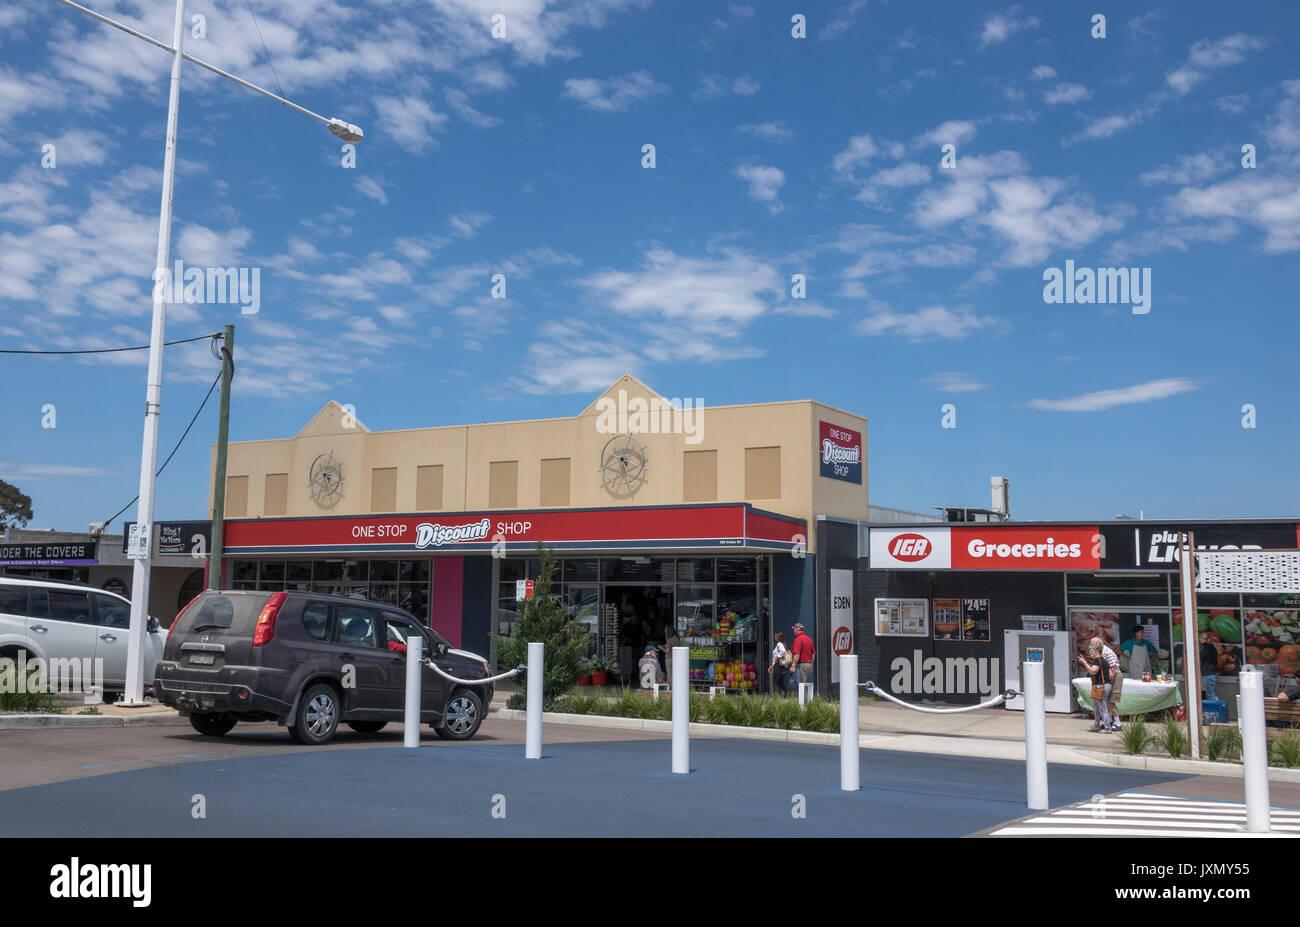 Discount Shop Stock Photos & Discount Shop Stock Images - Alamy